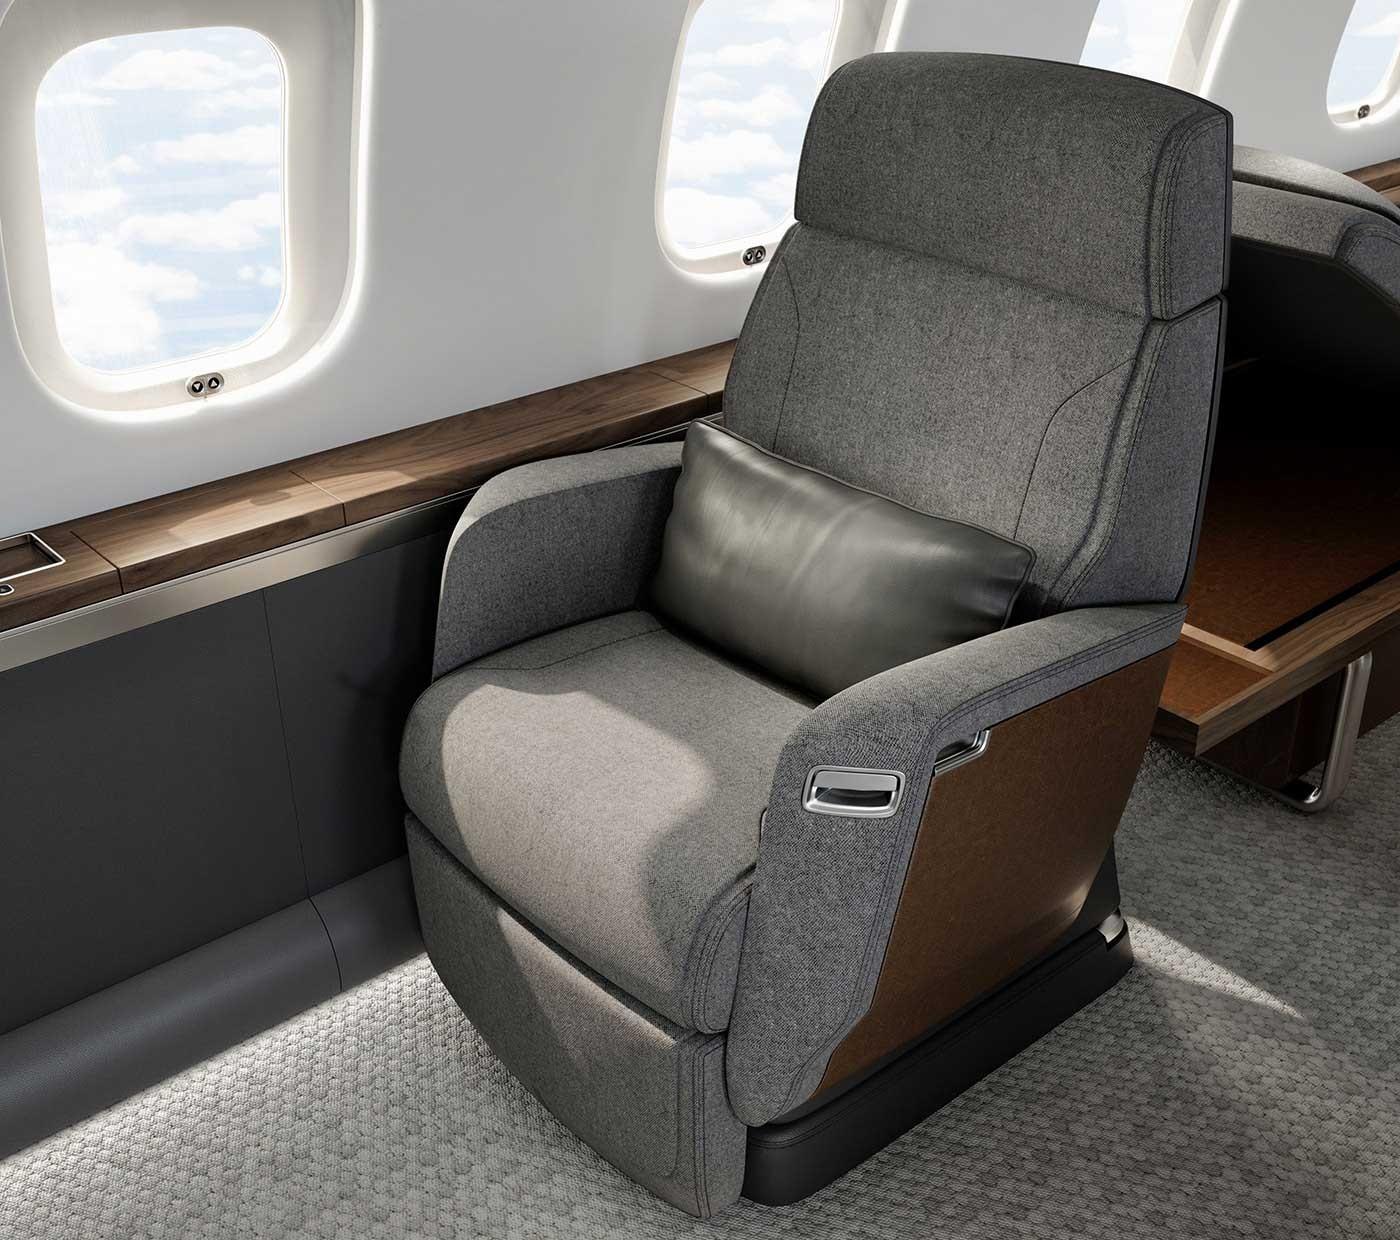 Global 6500 nuage seat